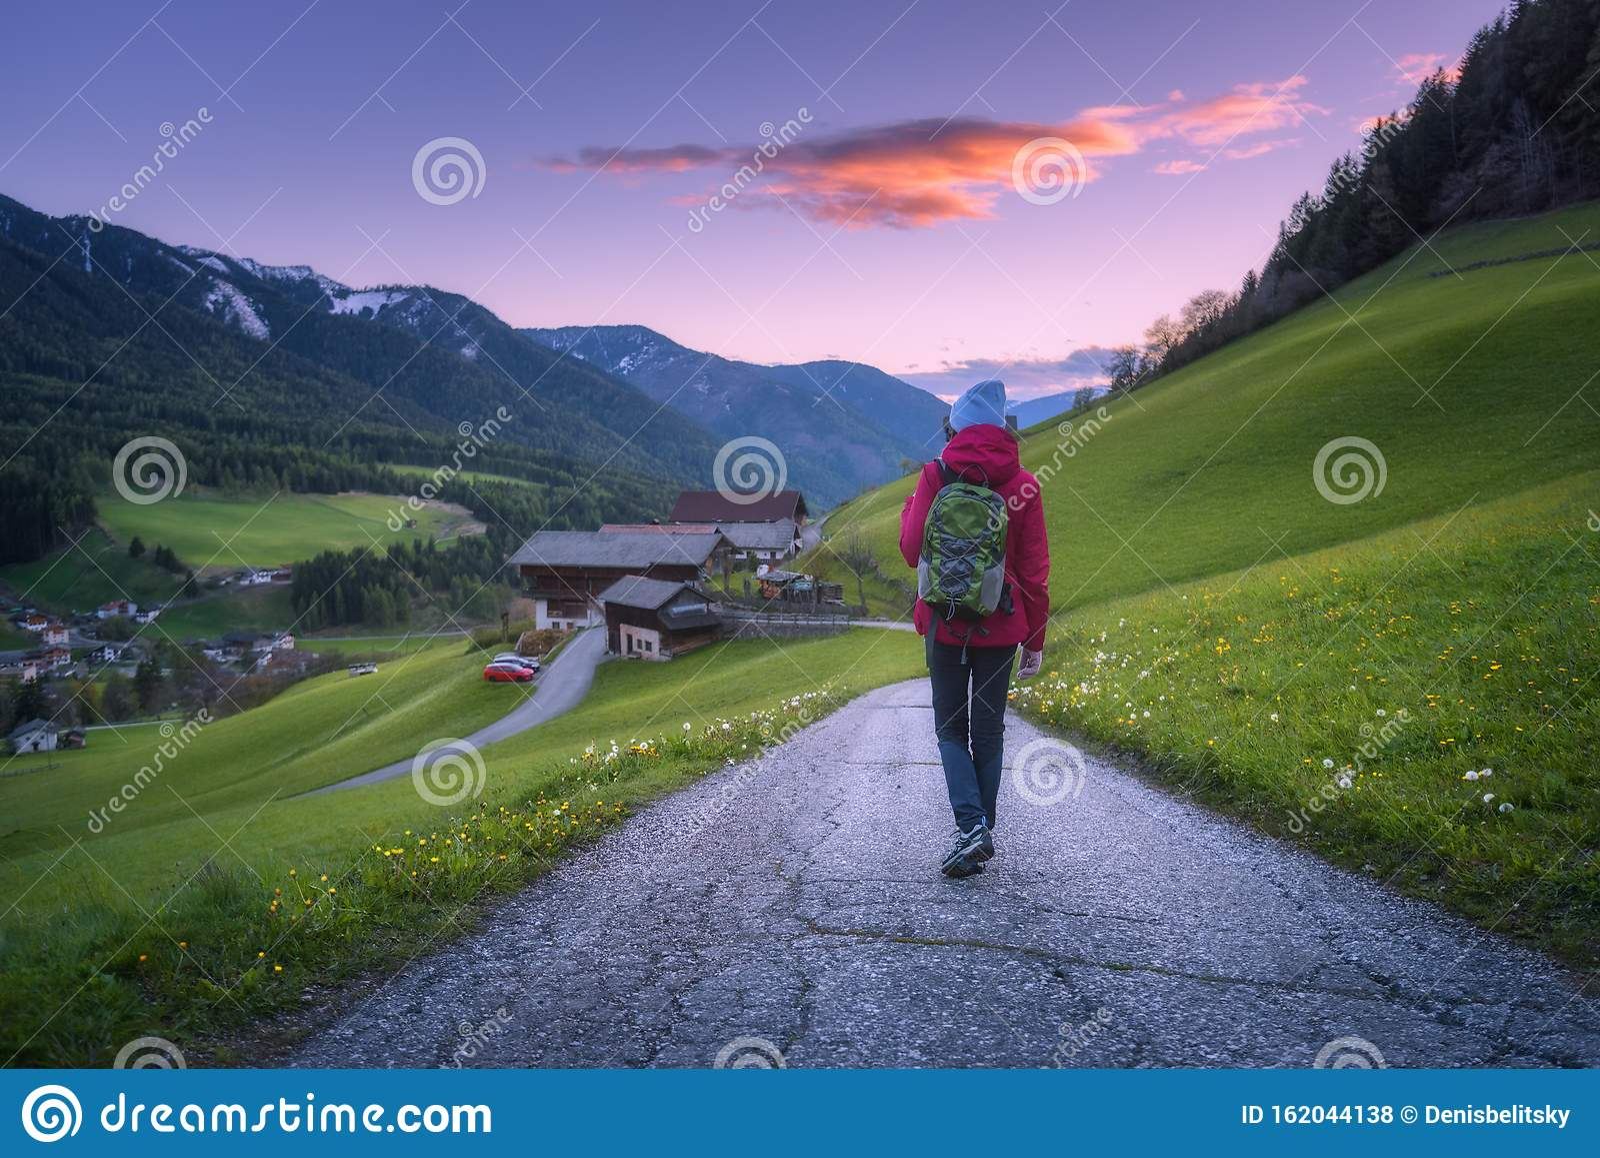 Young Woman And Teenage Girl Running Along Rural Road Rear